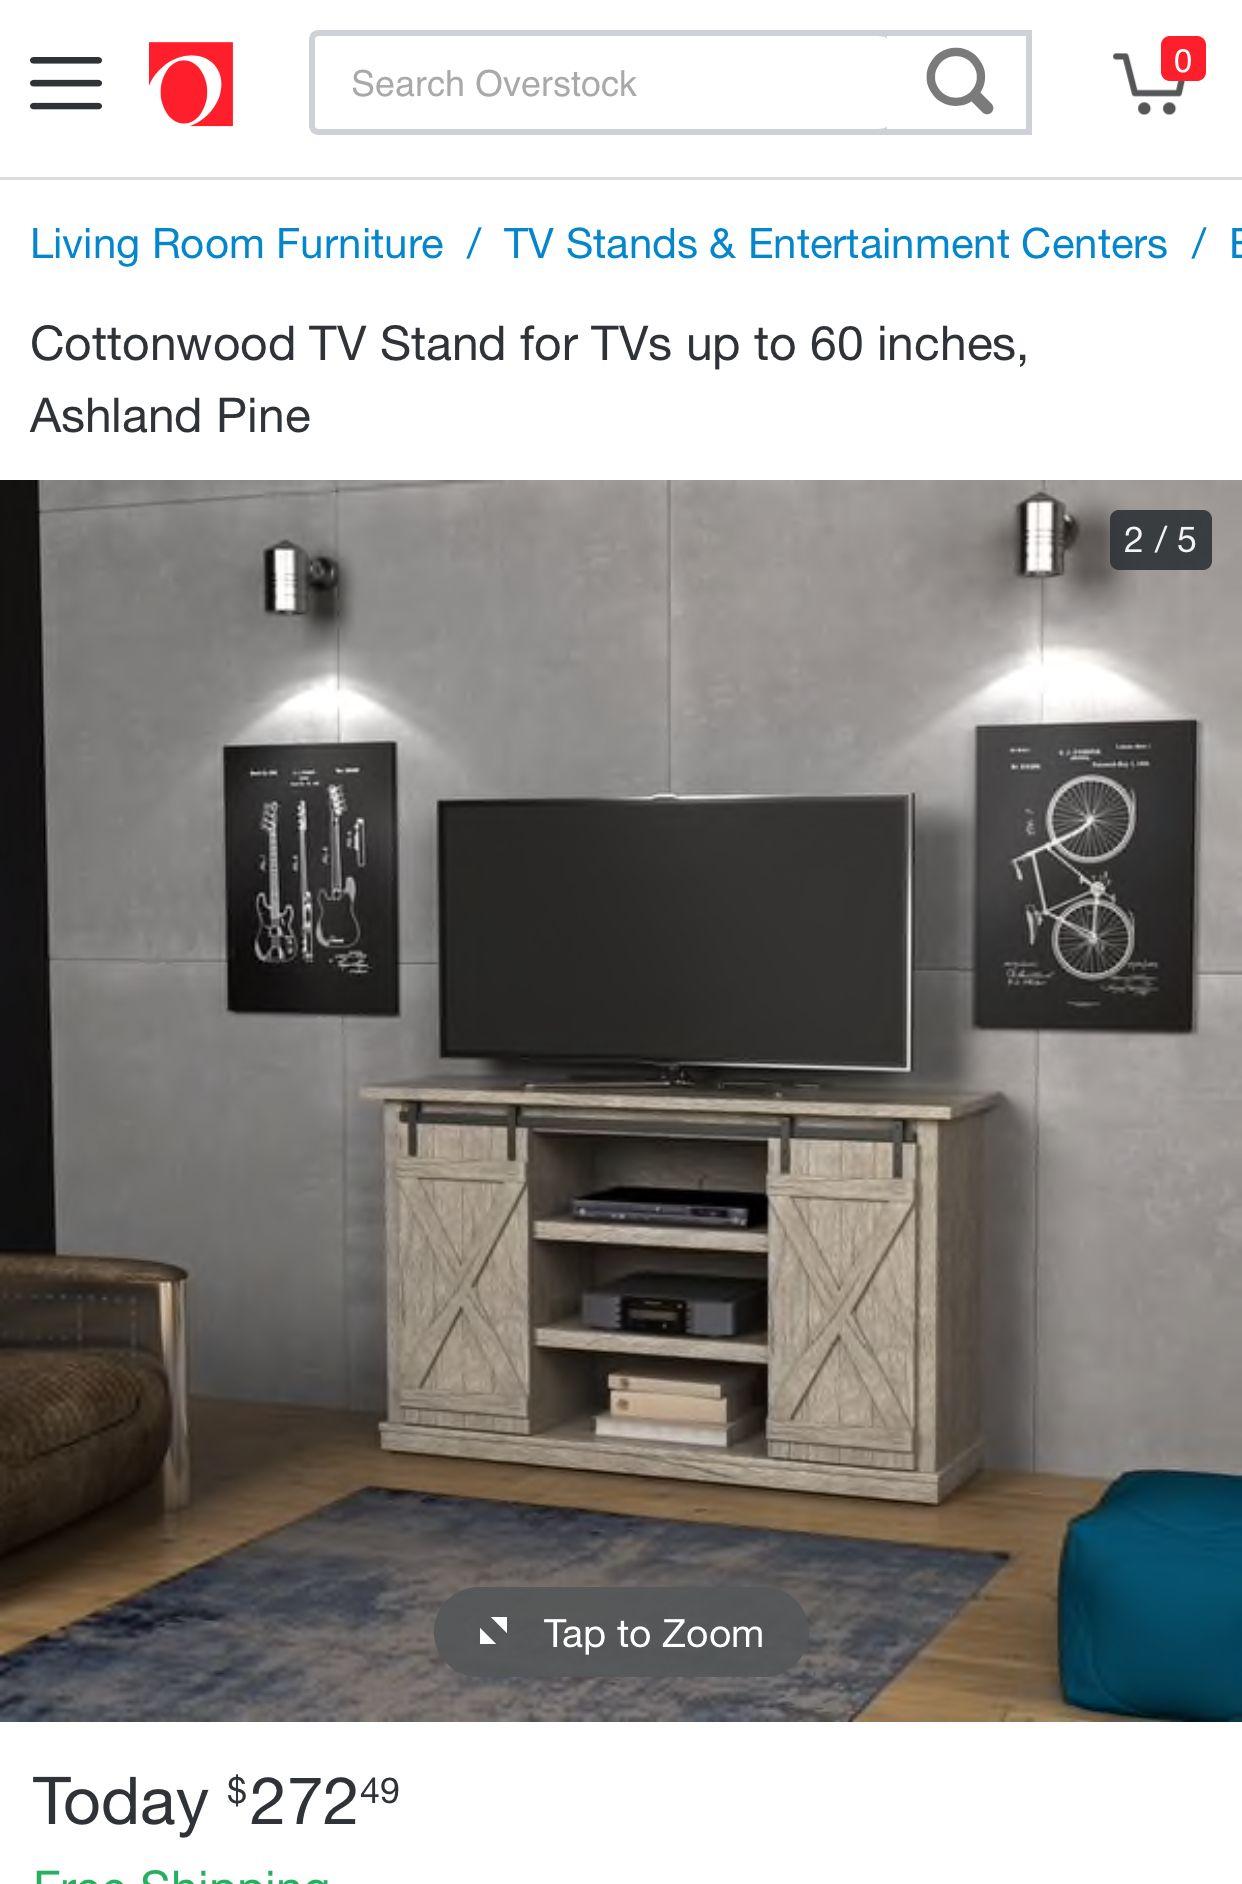 Overstockcom Online Shopping  Bedding, Furniture, Electronics, Jewelry, Clothing &